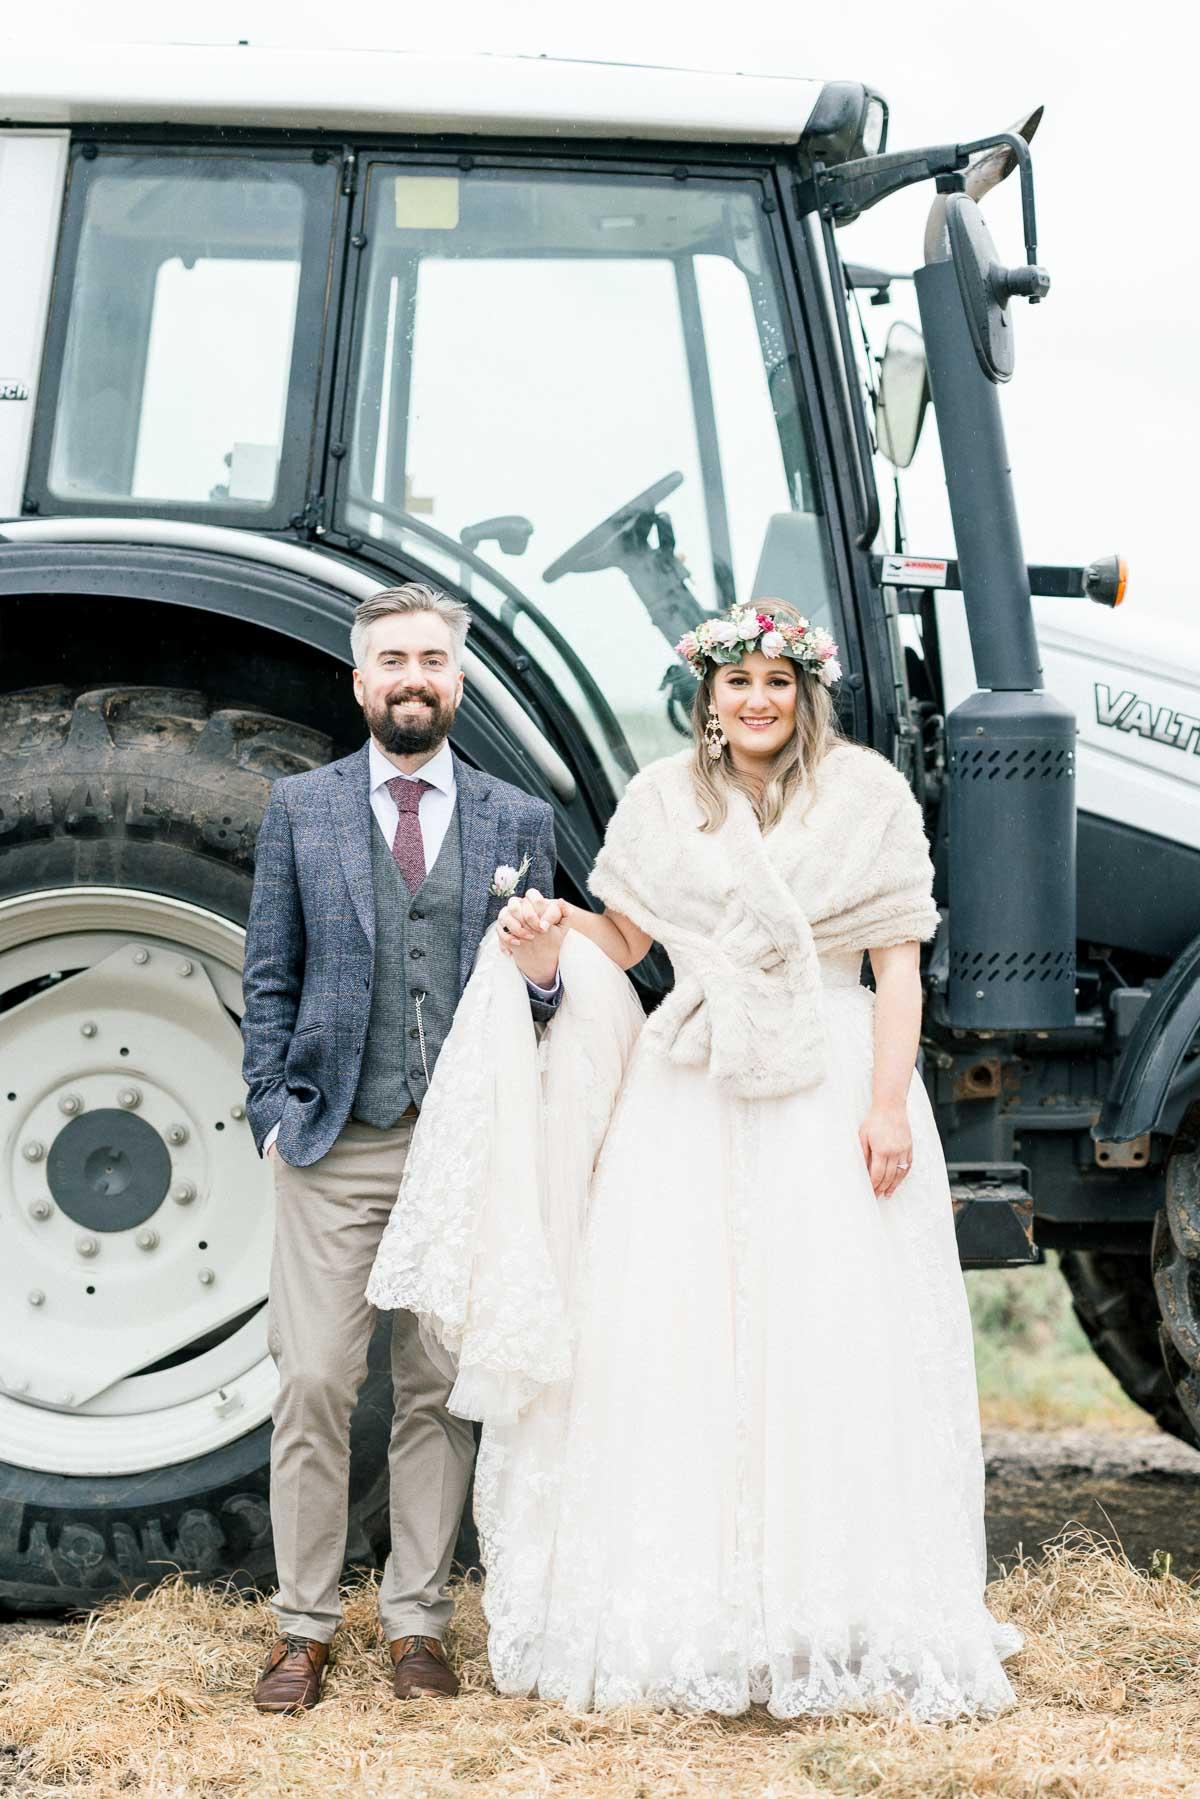 adams-farm-coldstream-yarra-valley-wedding-heart+soul-weddings-kel-jarryd-05660.jpg